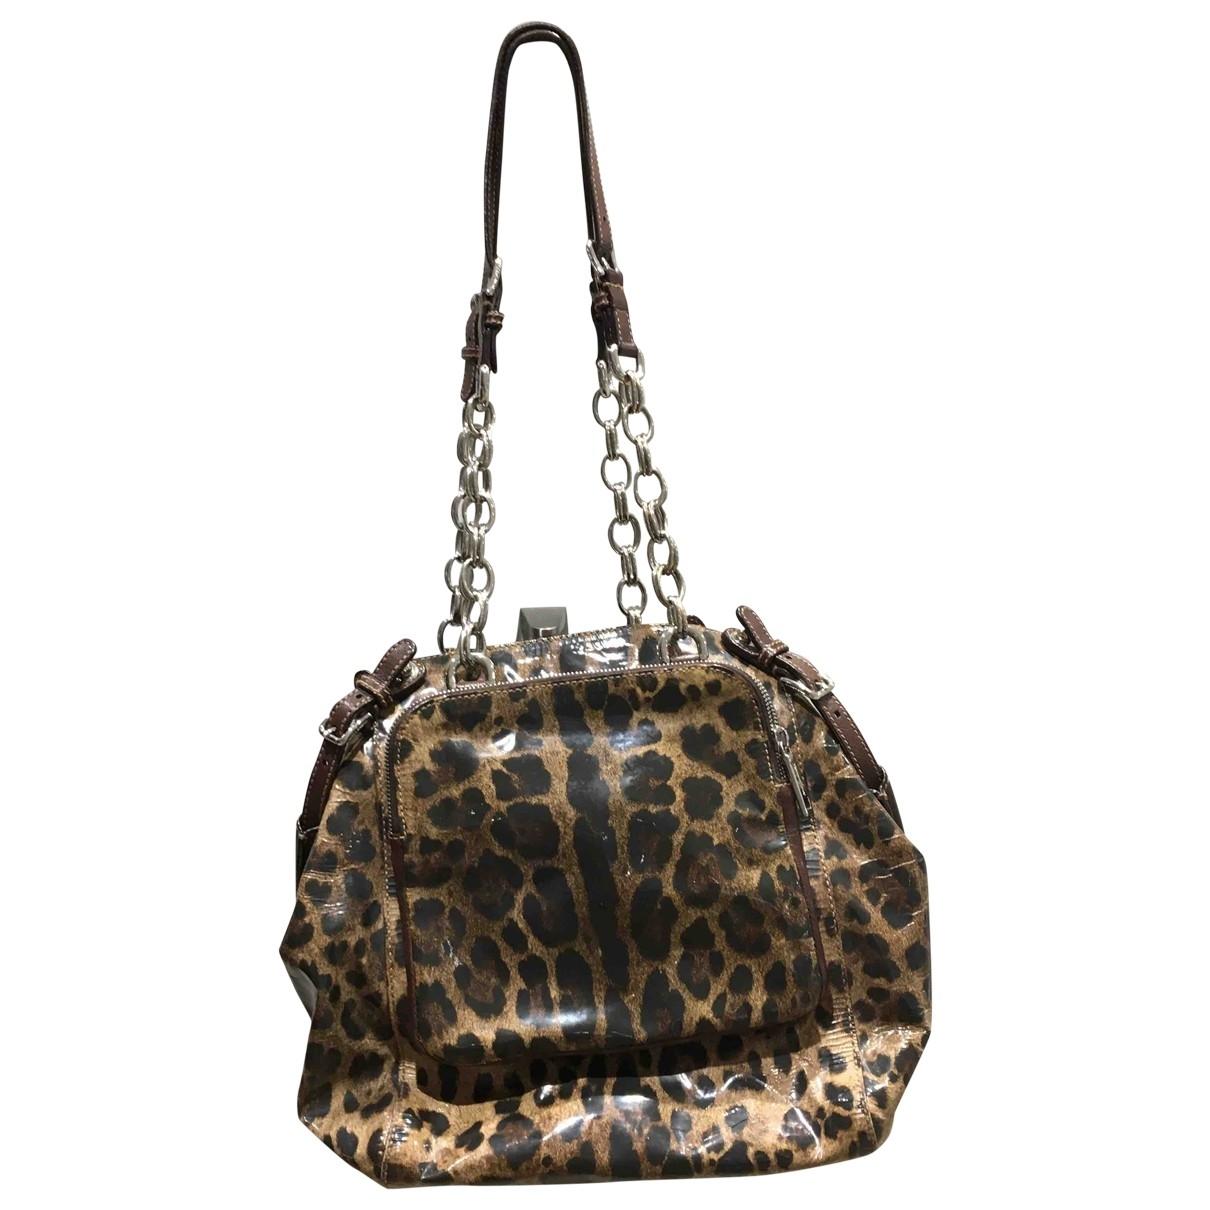 Dolce & Gabbana \N Brown Patent leather handbag for Women \N